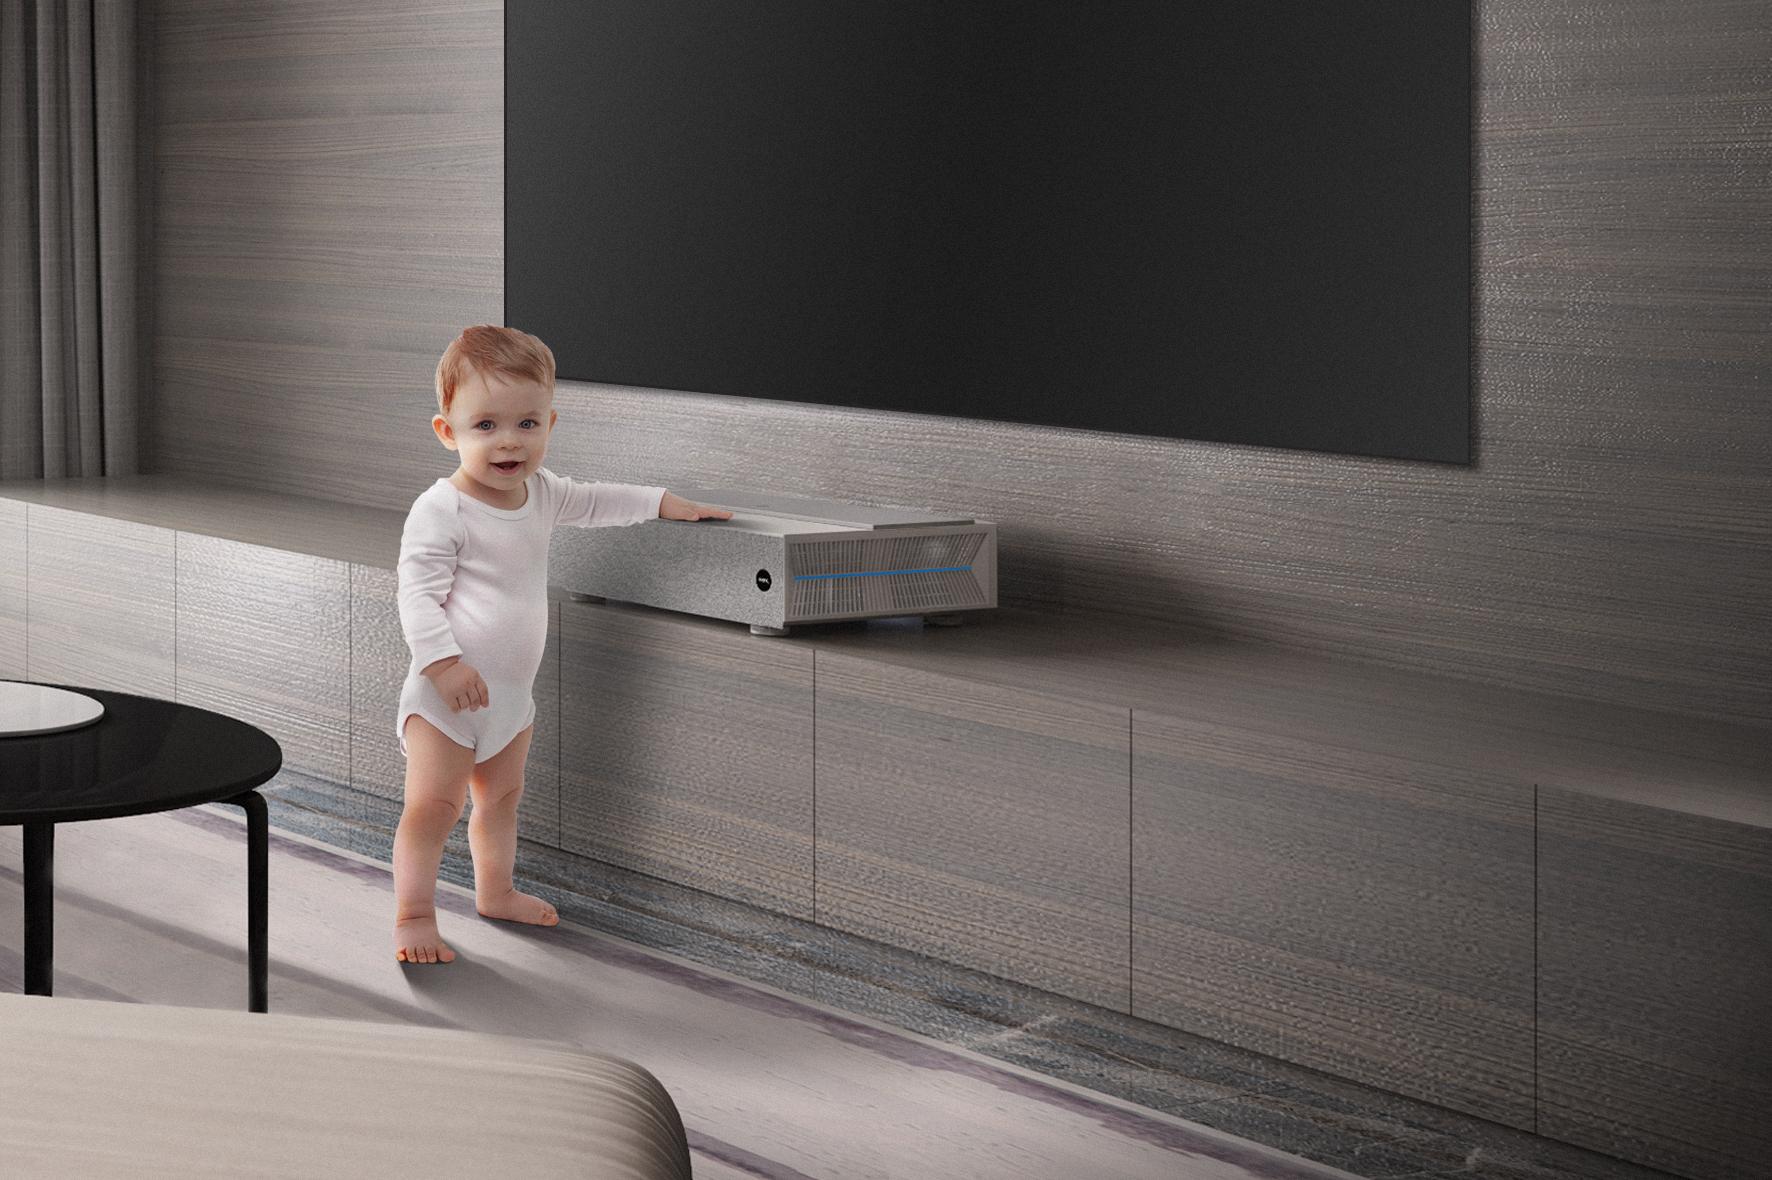 projector-lastertv-v6000-babycloselight-